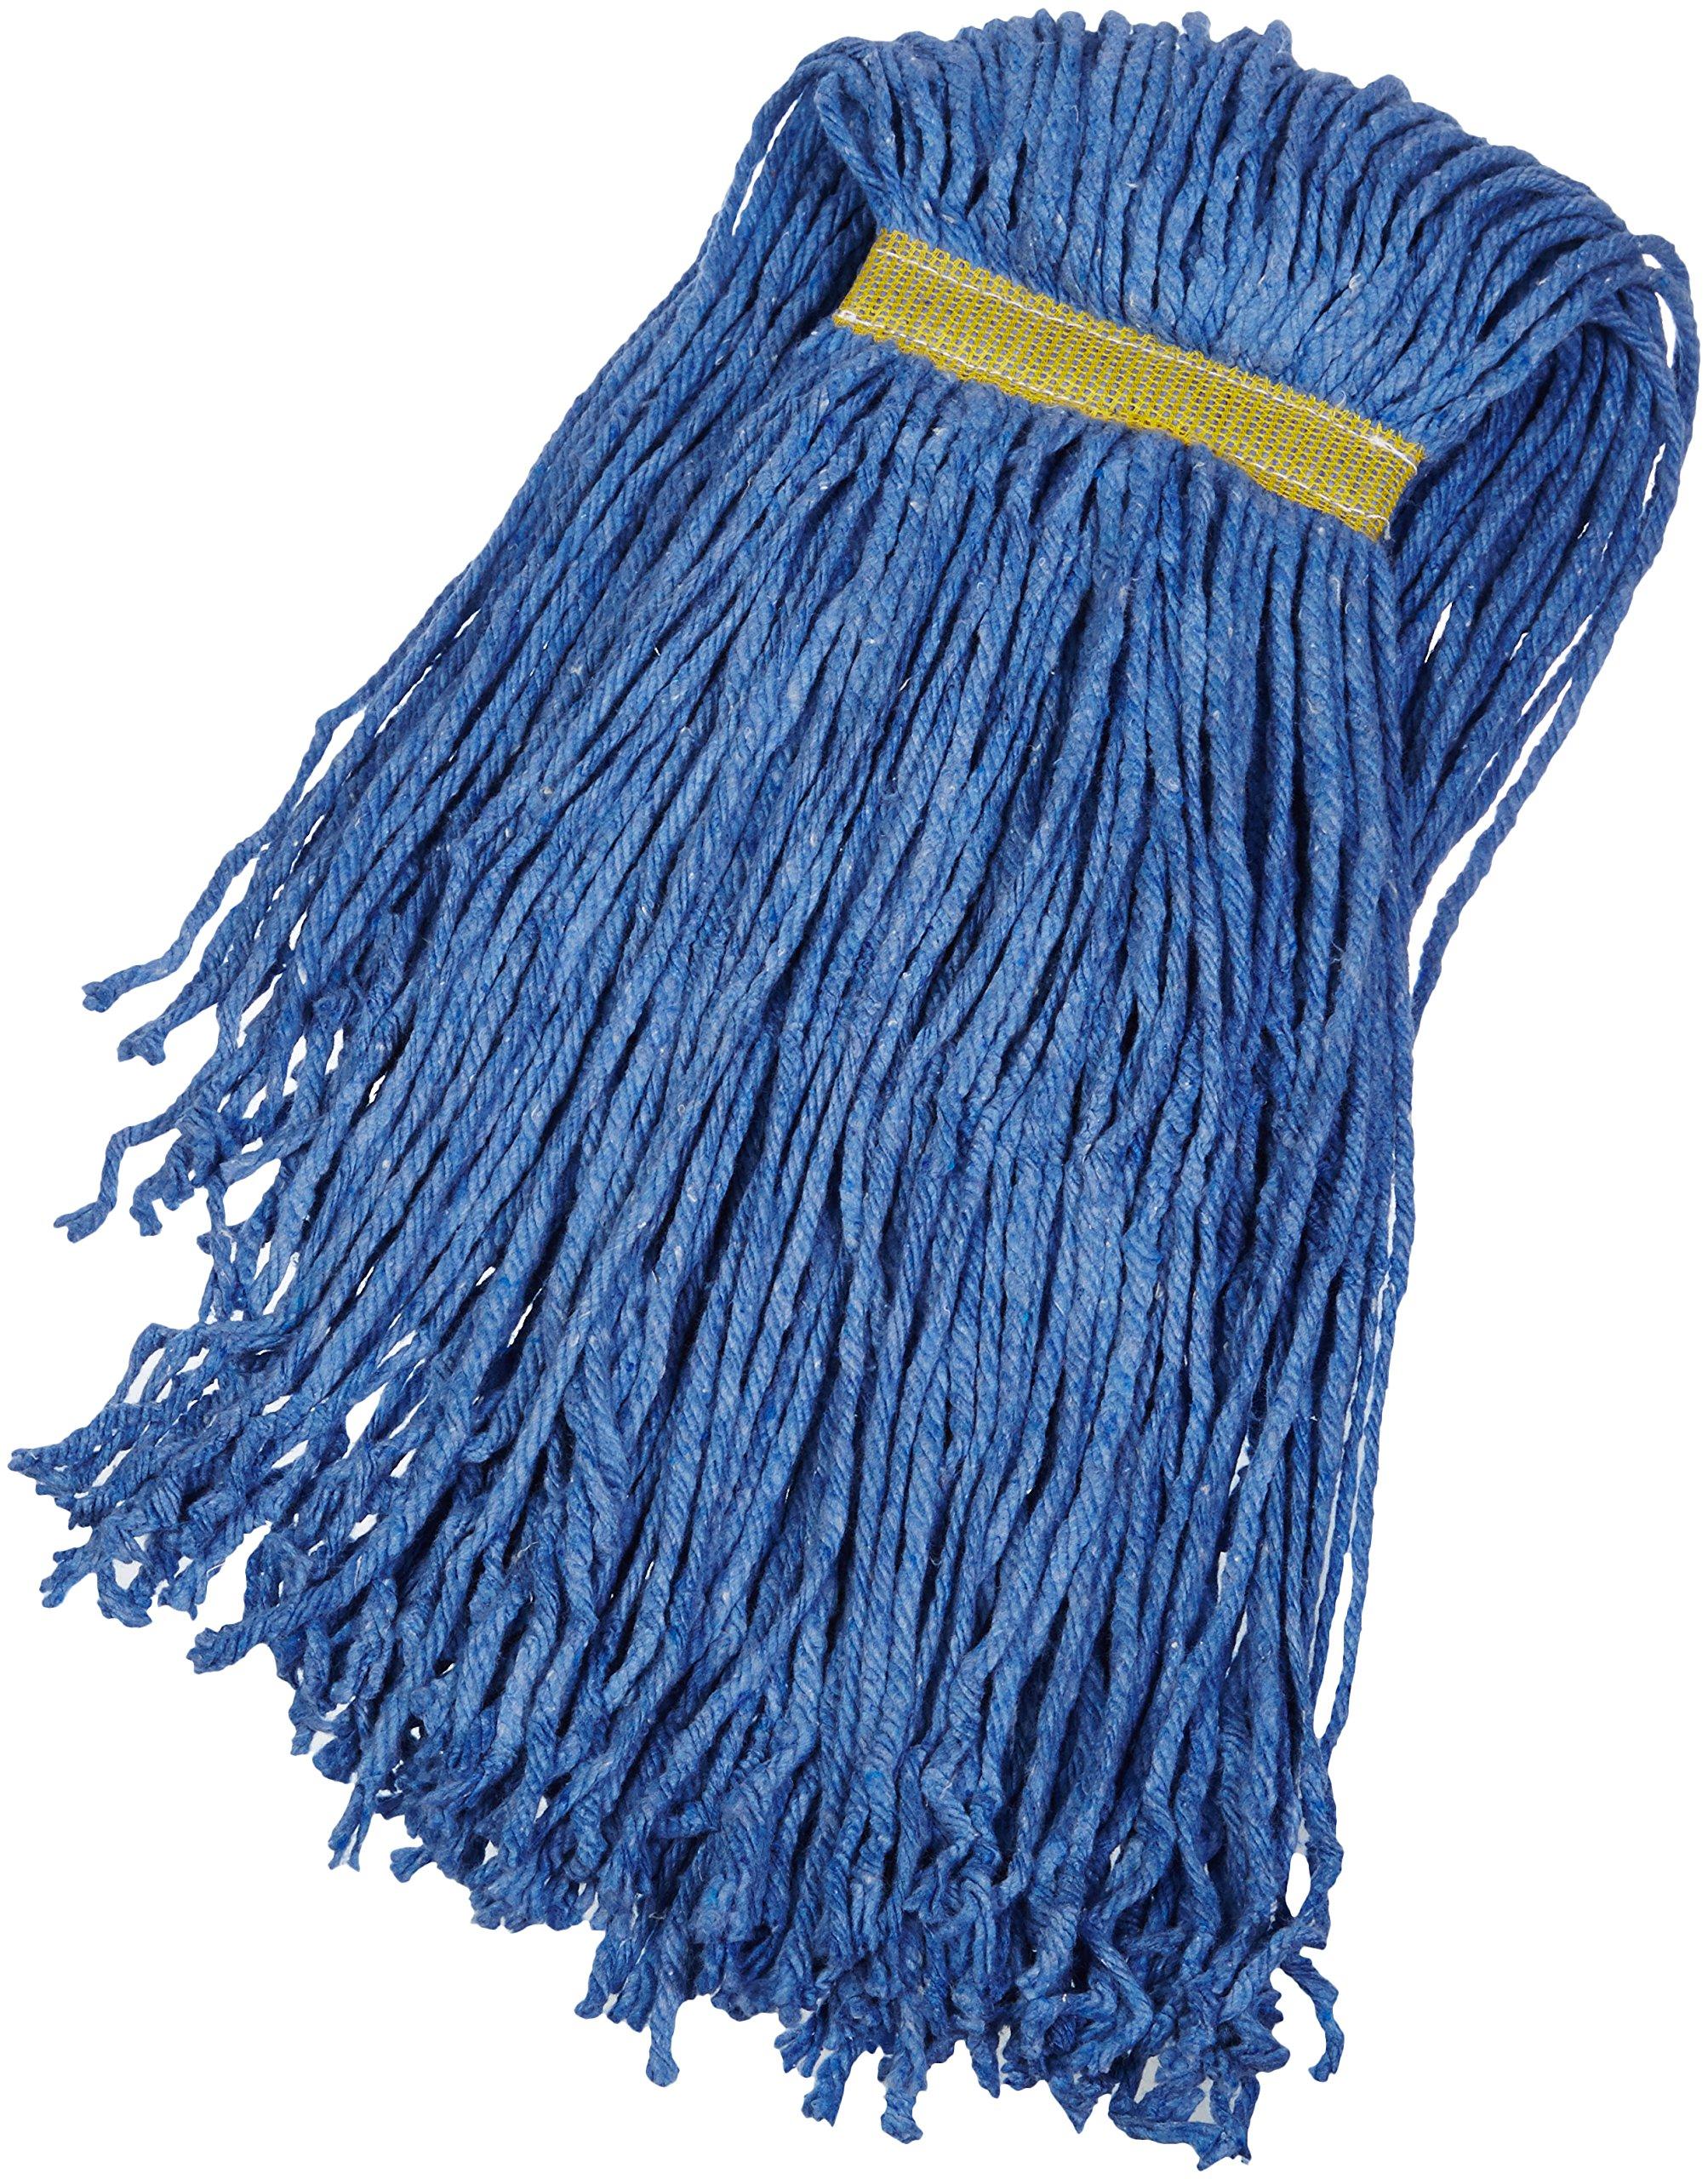 AmazonBasics Cut-End Cotton Mop Head, 1.25-Inch Headband, Large, Blue - 6-Pack